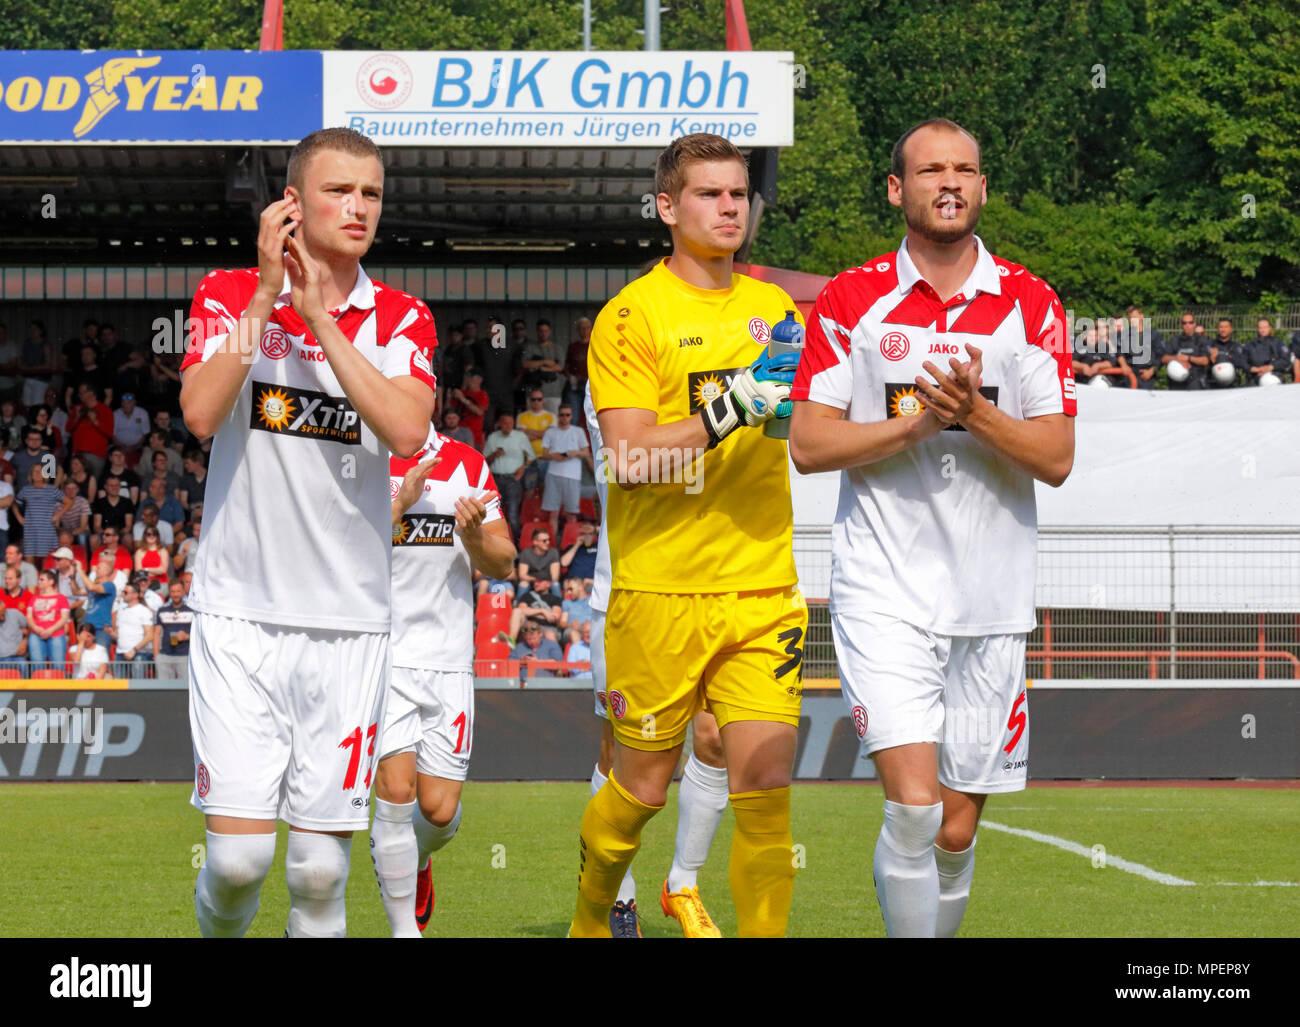 sports, football, Lower Rhine Cup, 2017/2018, final, Rot-Weiss Oberhausen vs Rot Weiss Essen 2:1, Stadium Niederrhein Oberhausen, Nico Lucas (RWE), keeper Robin Heller (RWE) and Robin Urban (RWE) f.l.t.r. welcome their fans - Stock Image